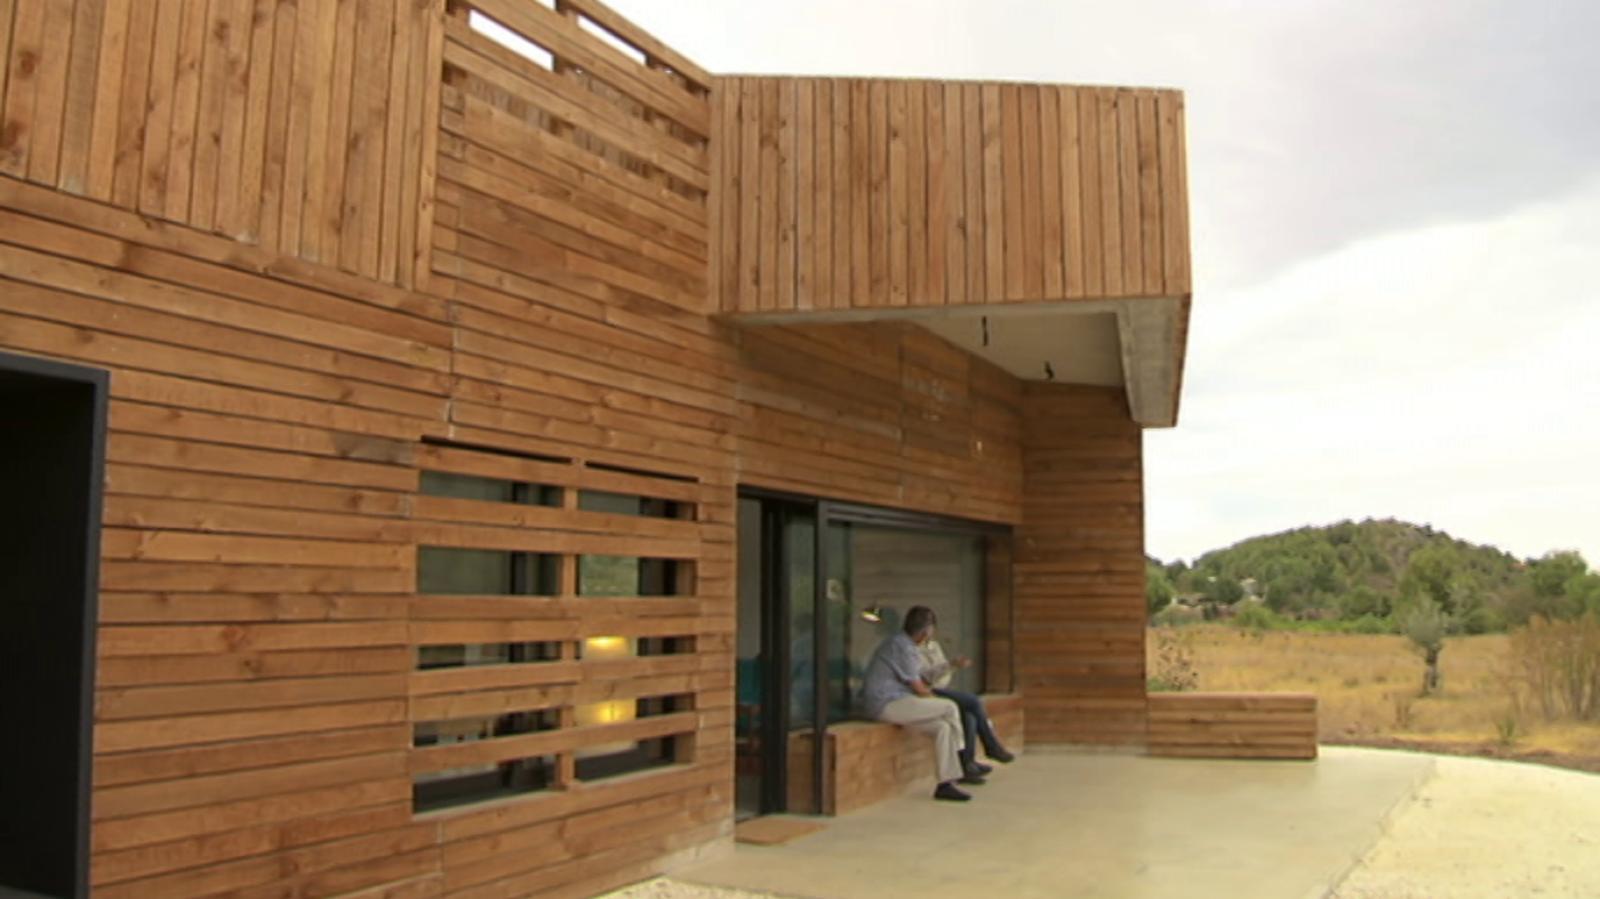 Edificios - Tradición contemporánea - ver ahora